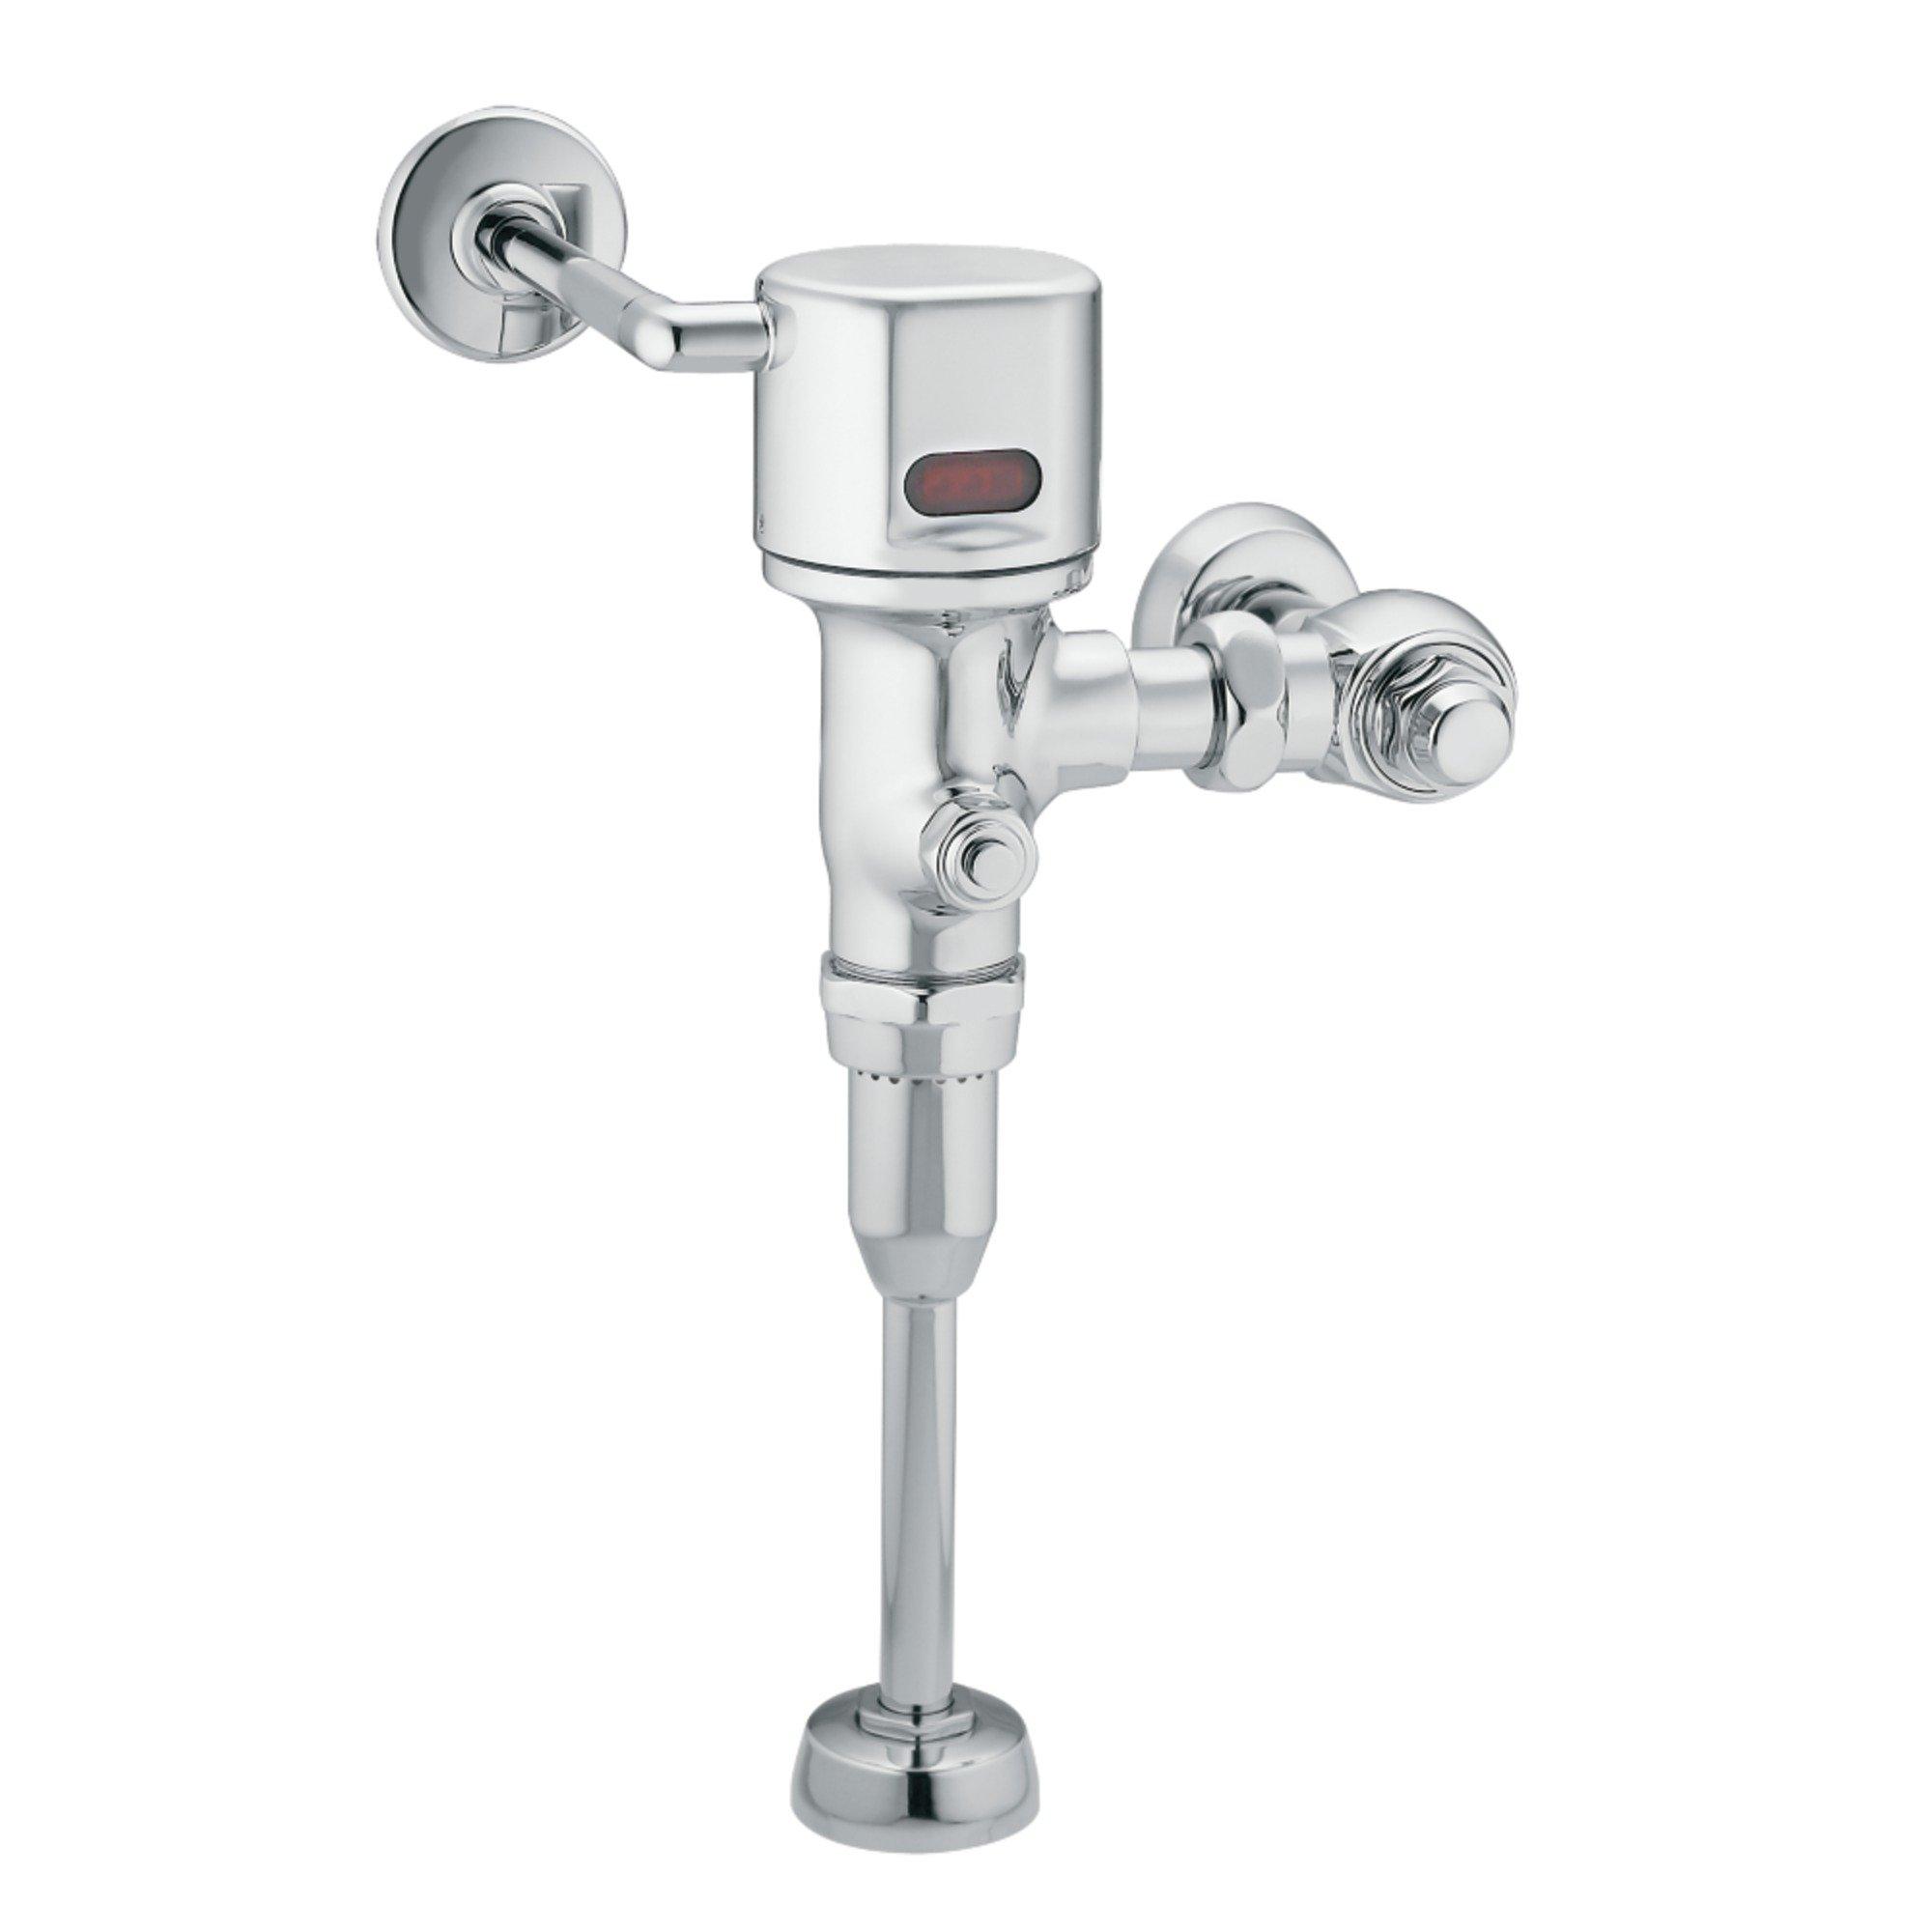 Moen 8316AC Commercial M-Power Electronic AC Powered Sensor Operated Urinal Flush Valve, .125 gpf, Chrome